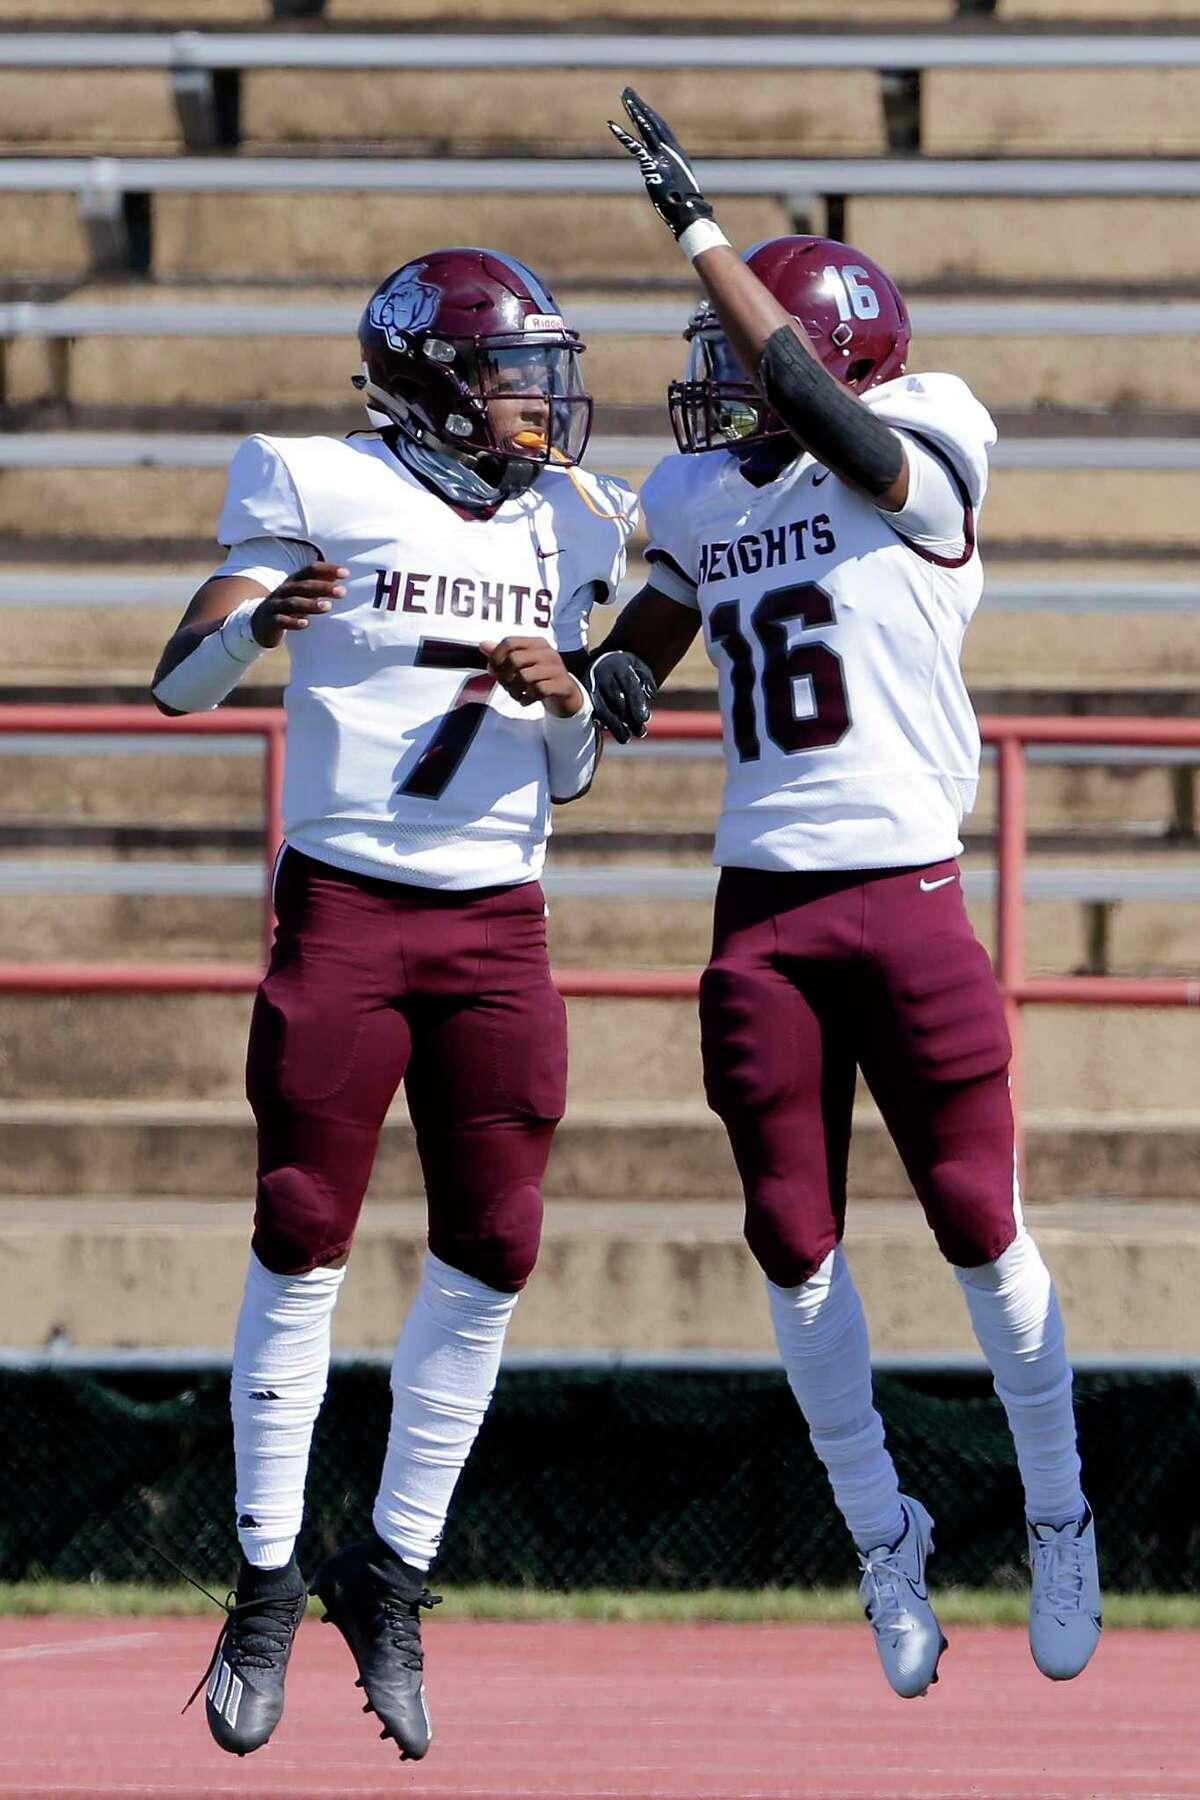 Heights quarterback Jalen Morrison (7) and receiver Keyondrick Douglas (16) celebrate Douglas' touchdown during their their game against Westside at Butler Stadium Saturday, Oct. 31, 2020 in Houston, TX.